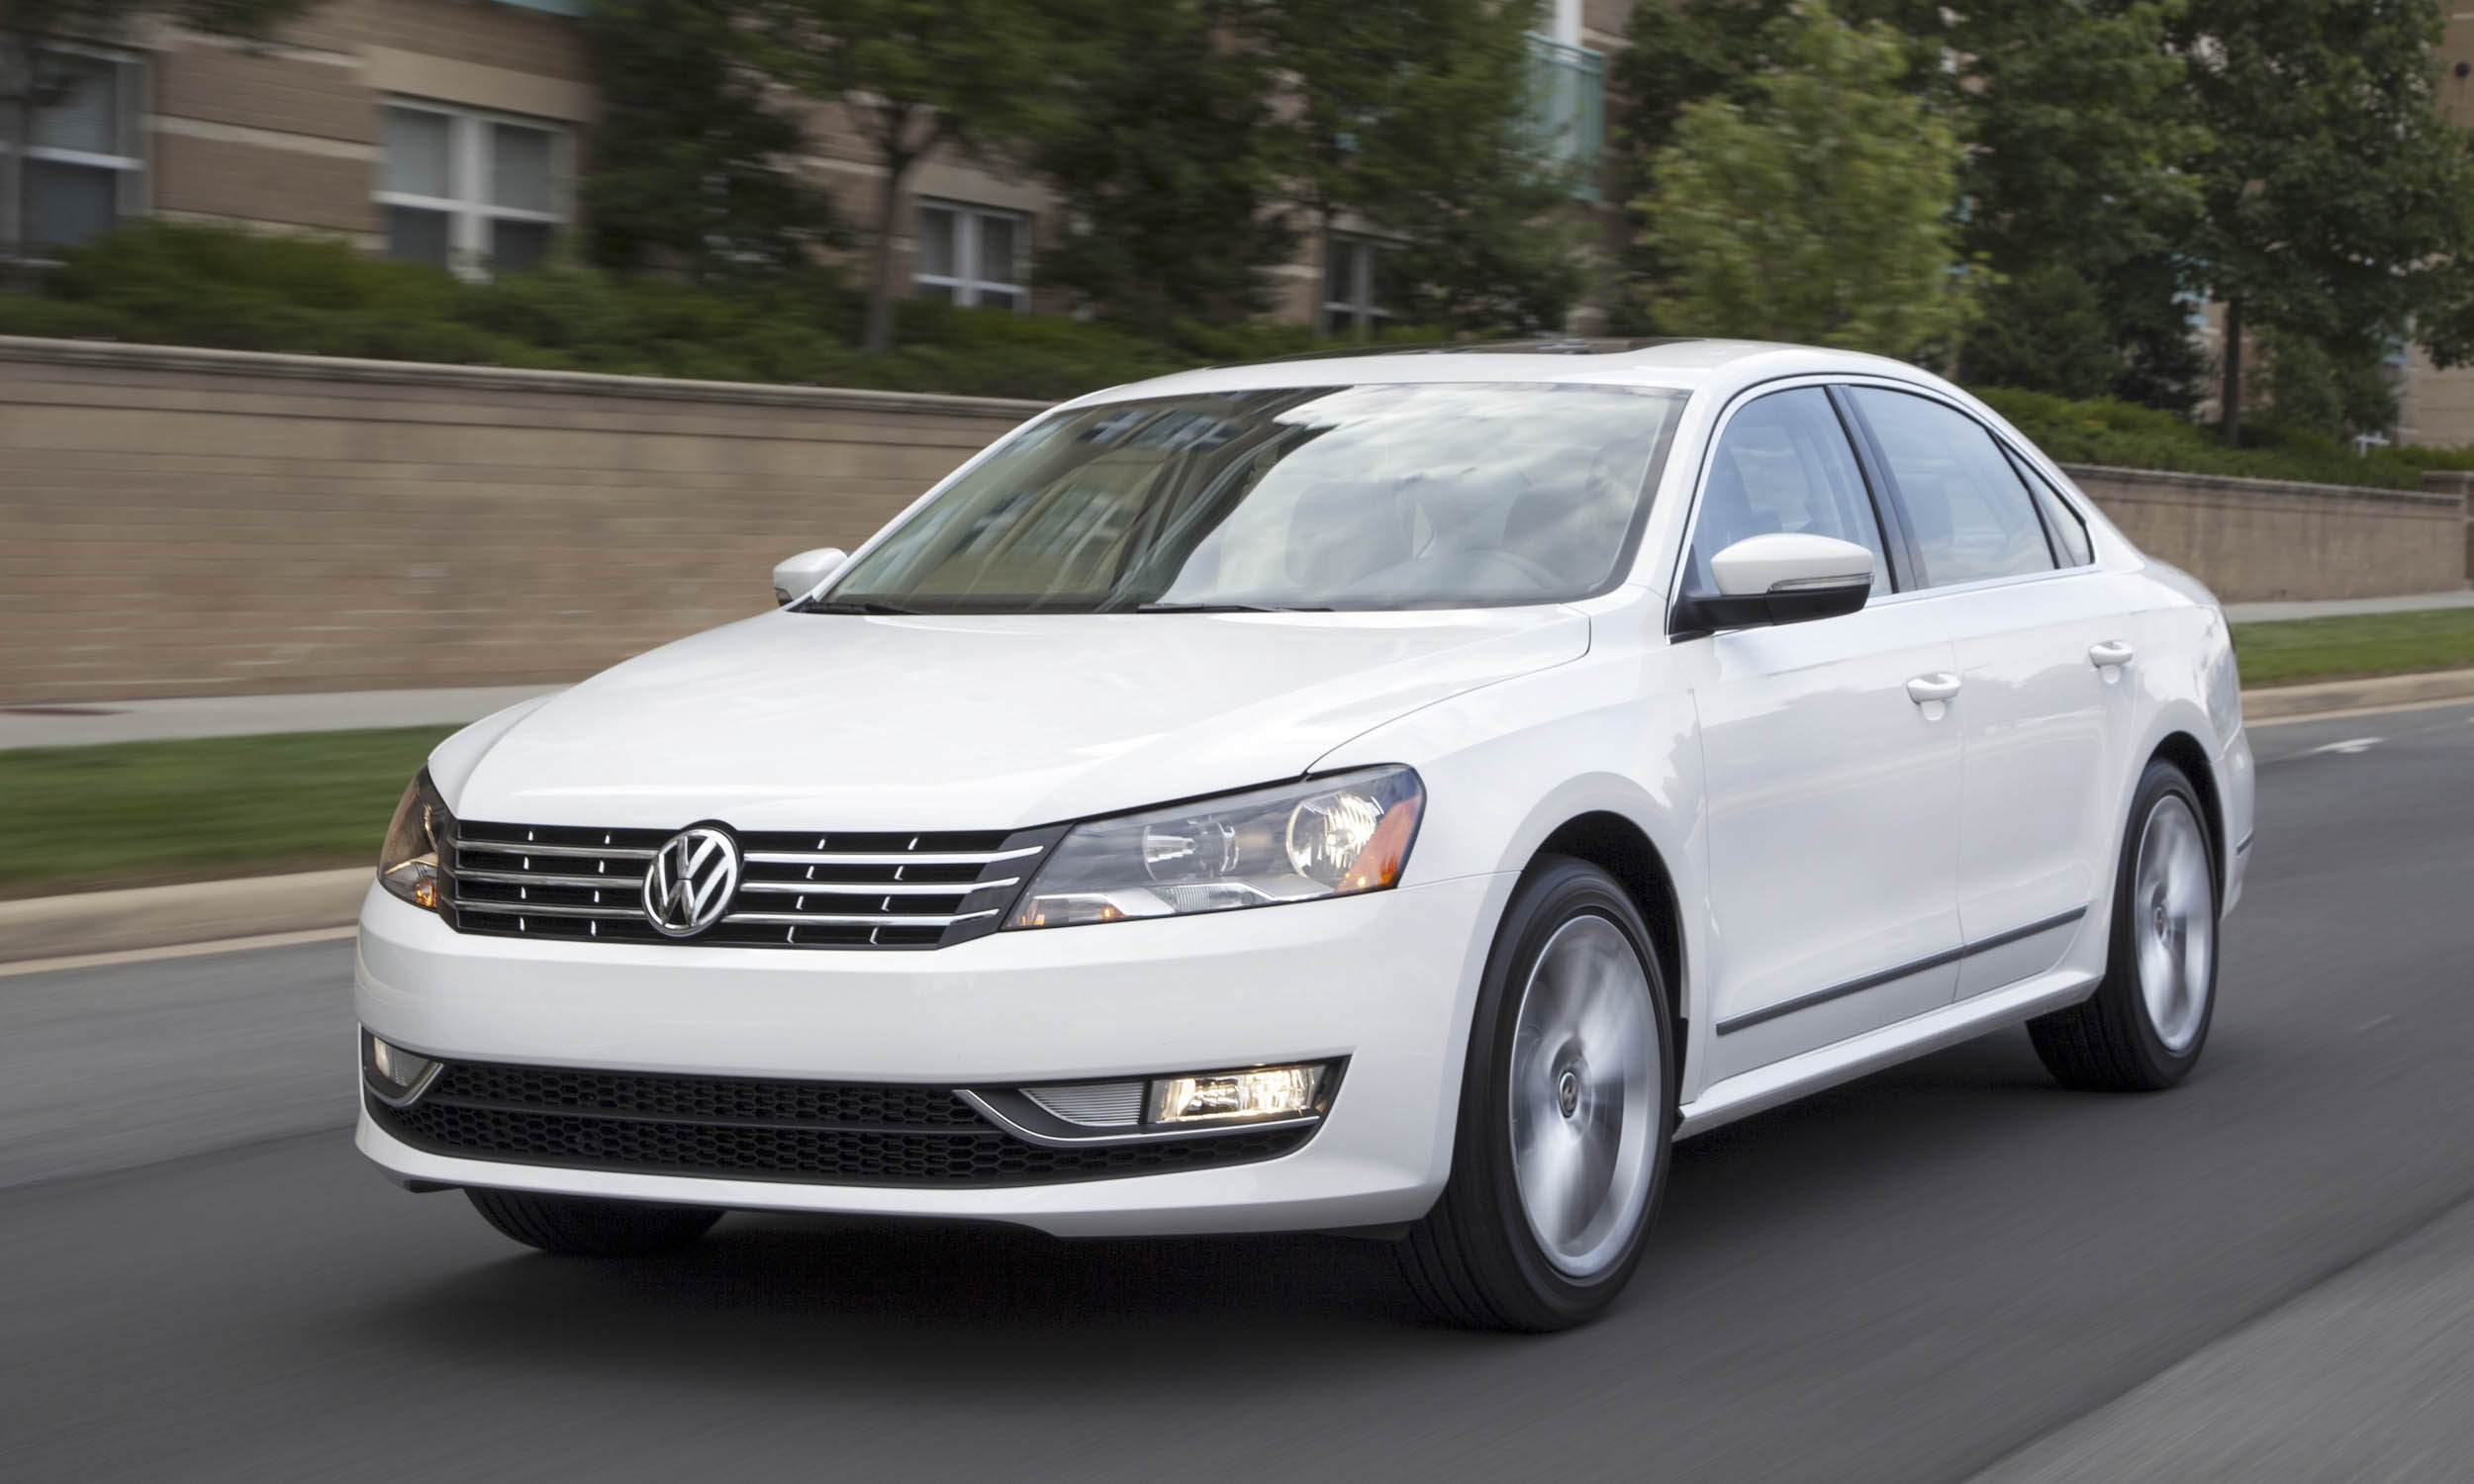 2013 Volkswagen Passat3?utm_source=rss&utm_medium=rss latest automotive safety recalls autonxt  at gsmx.co